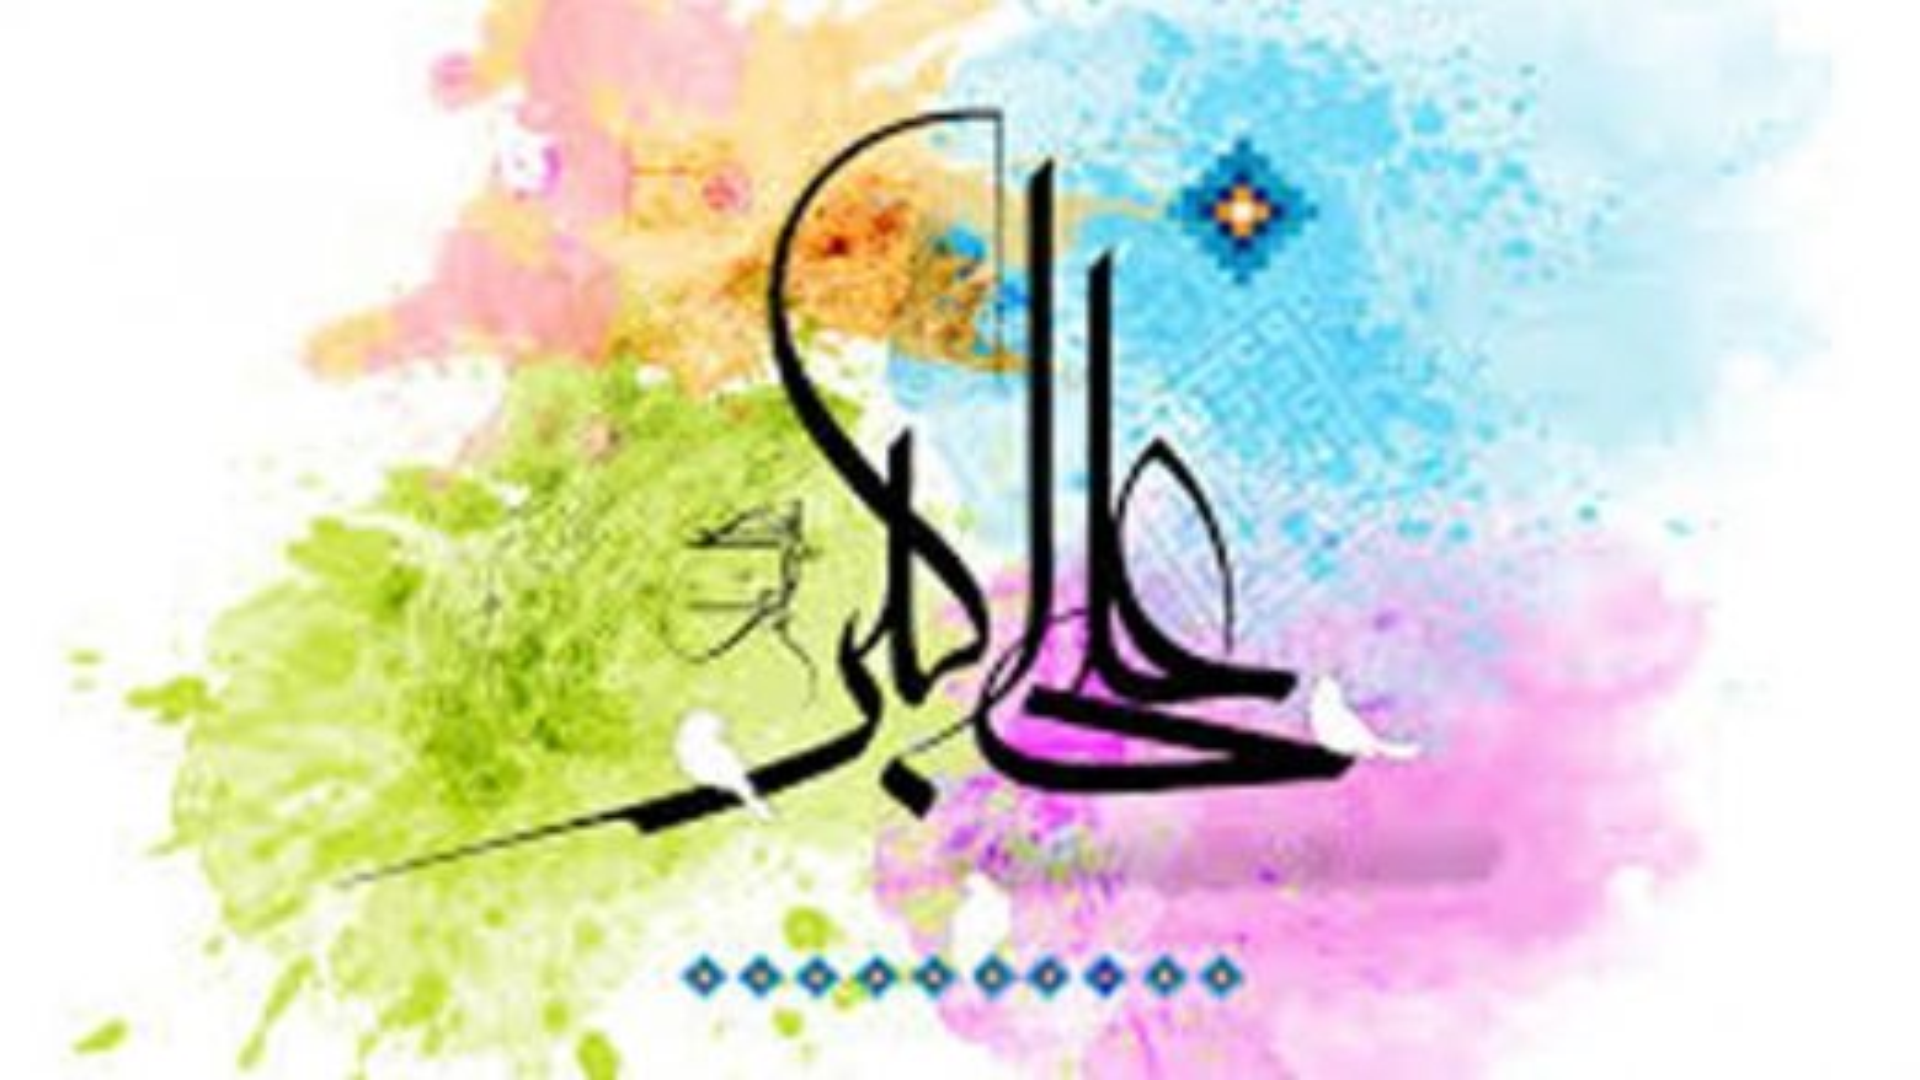 حضرت علی اکبر (ع) | تگ